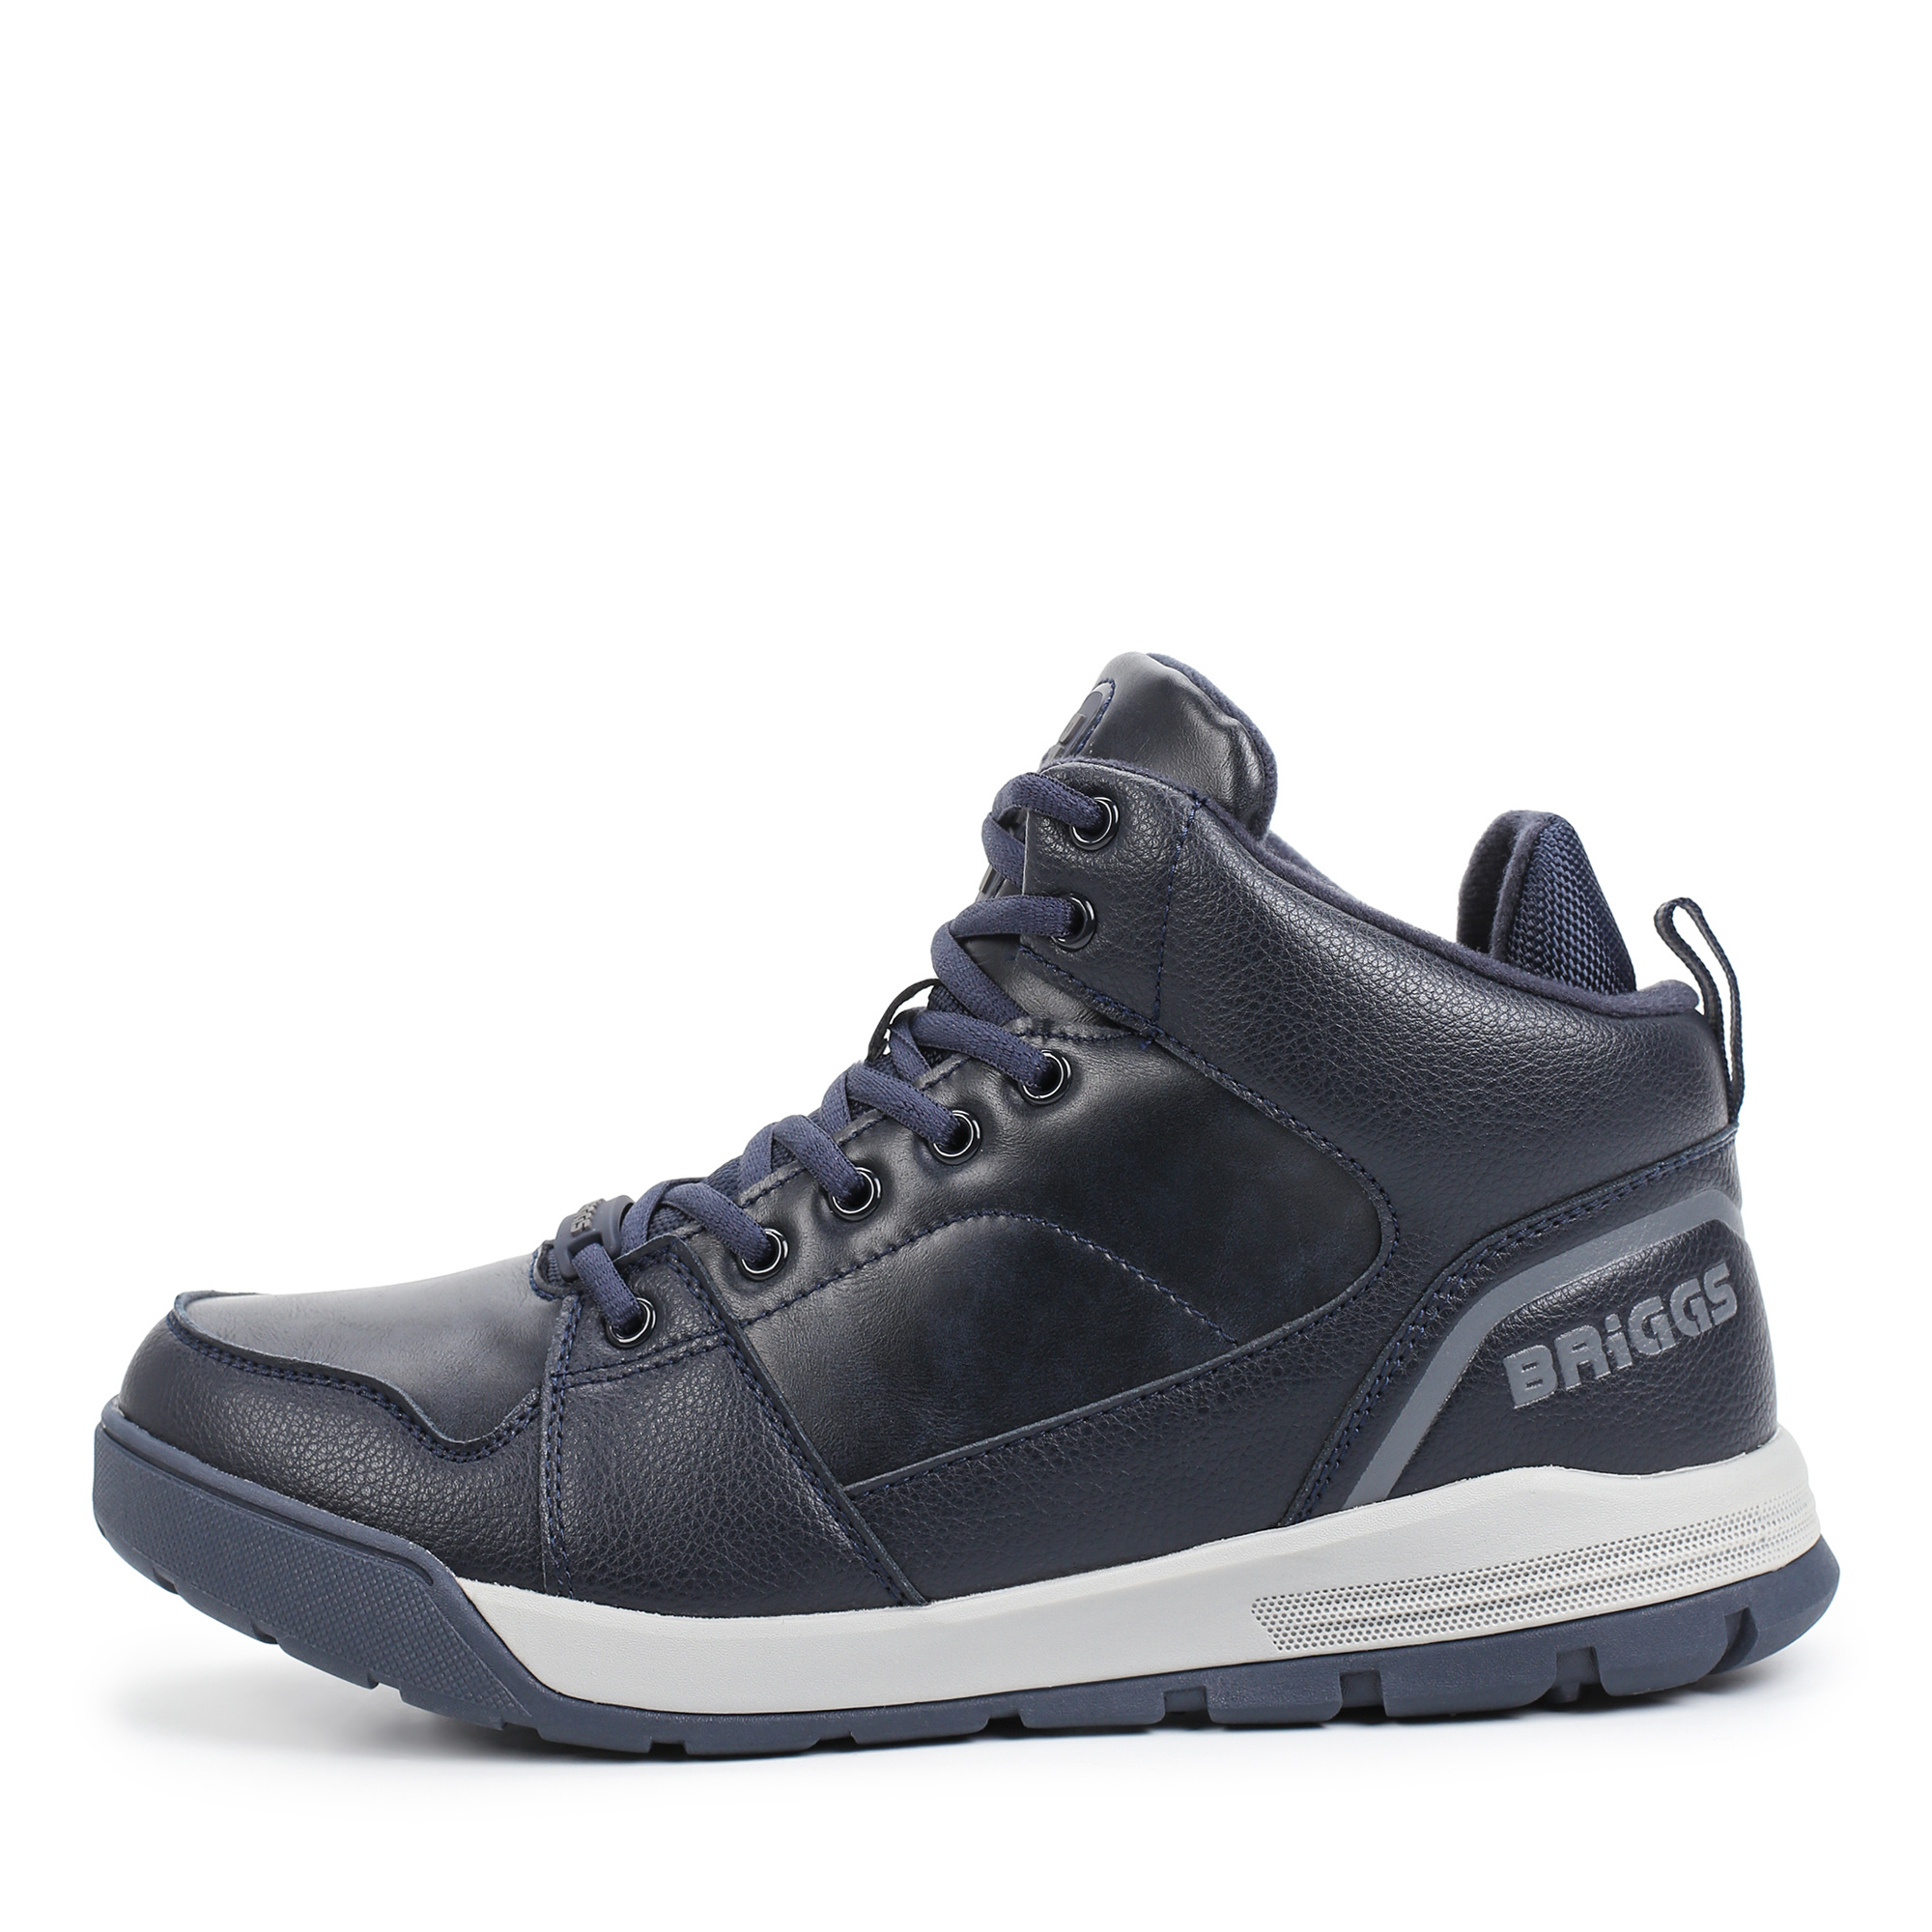 Ботинки BRIGGS 064-080B-4603